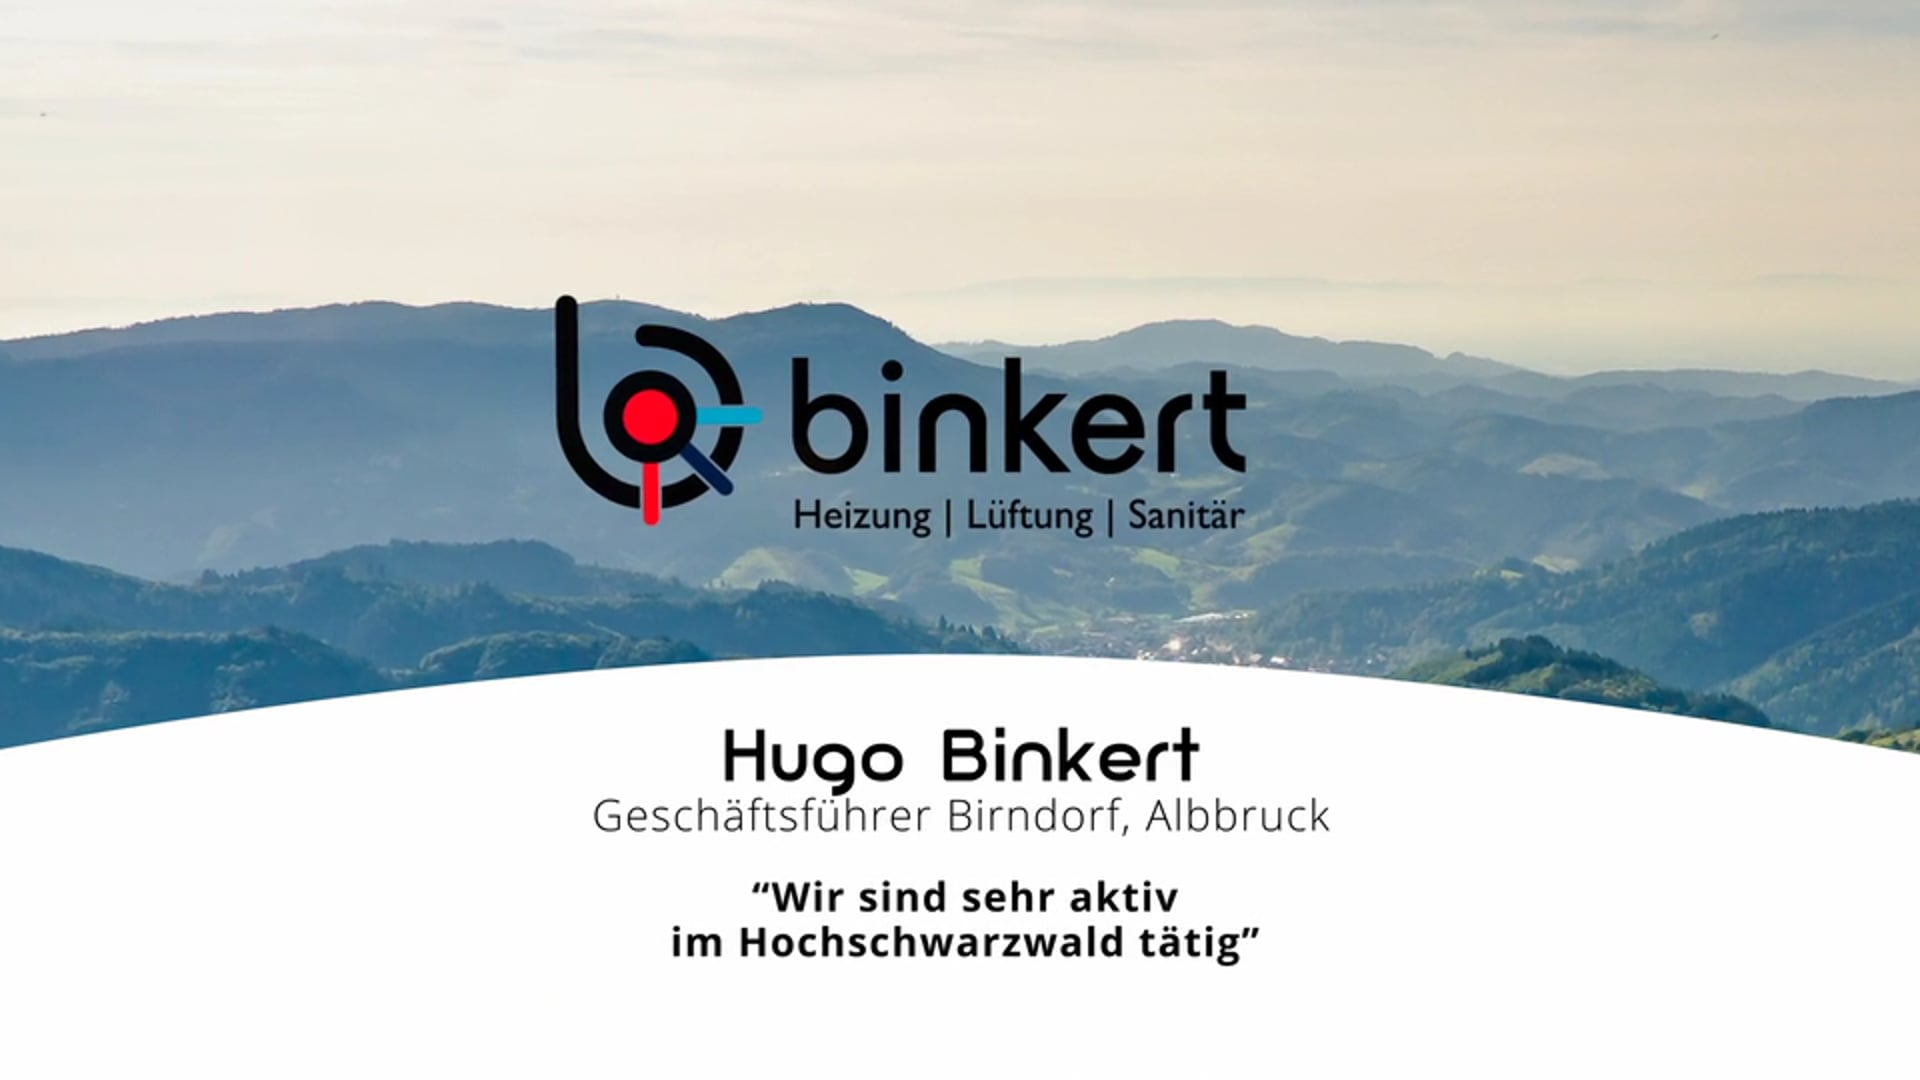 Hugo Binkert über Binkert Titisee-Neustadt